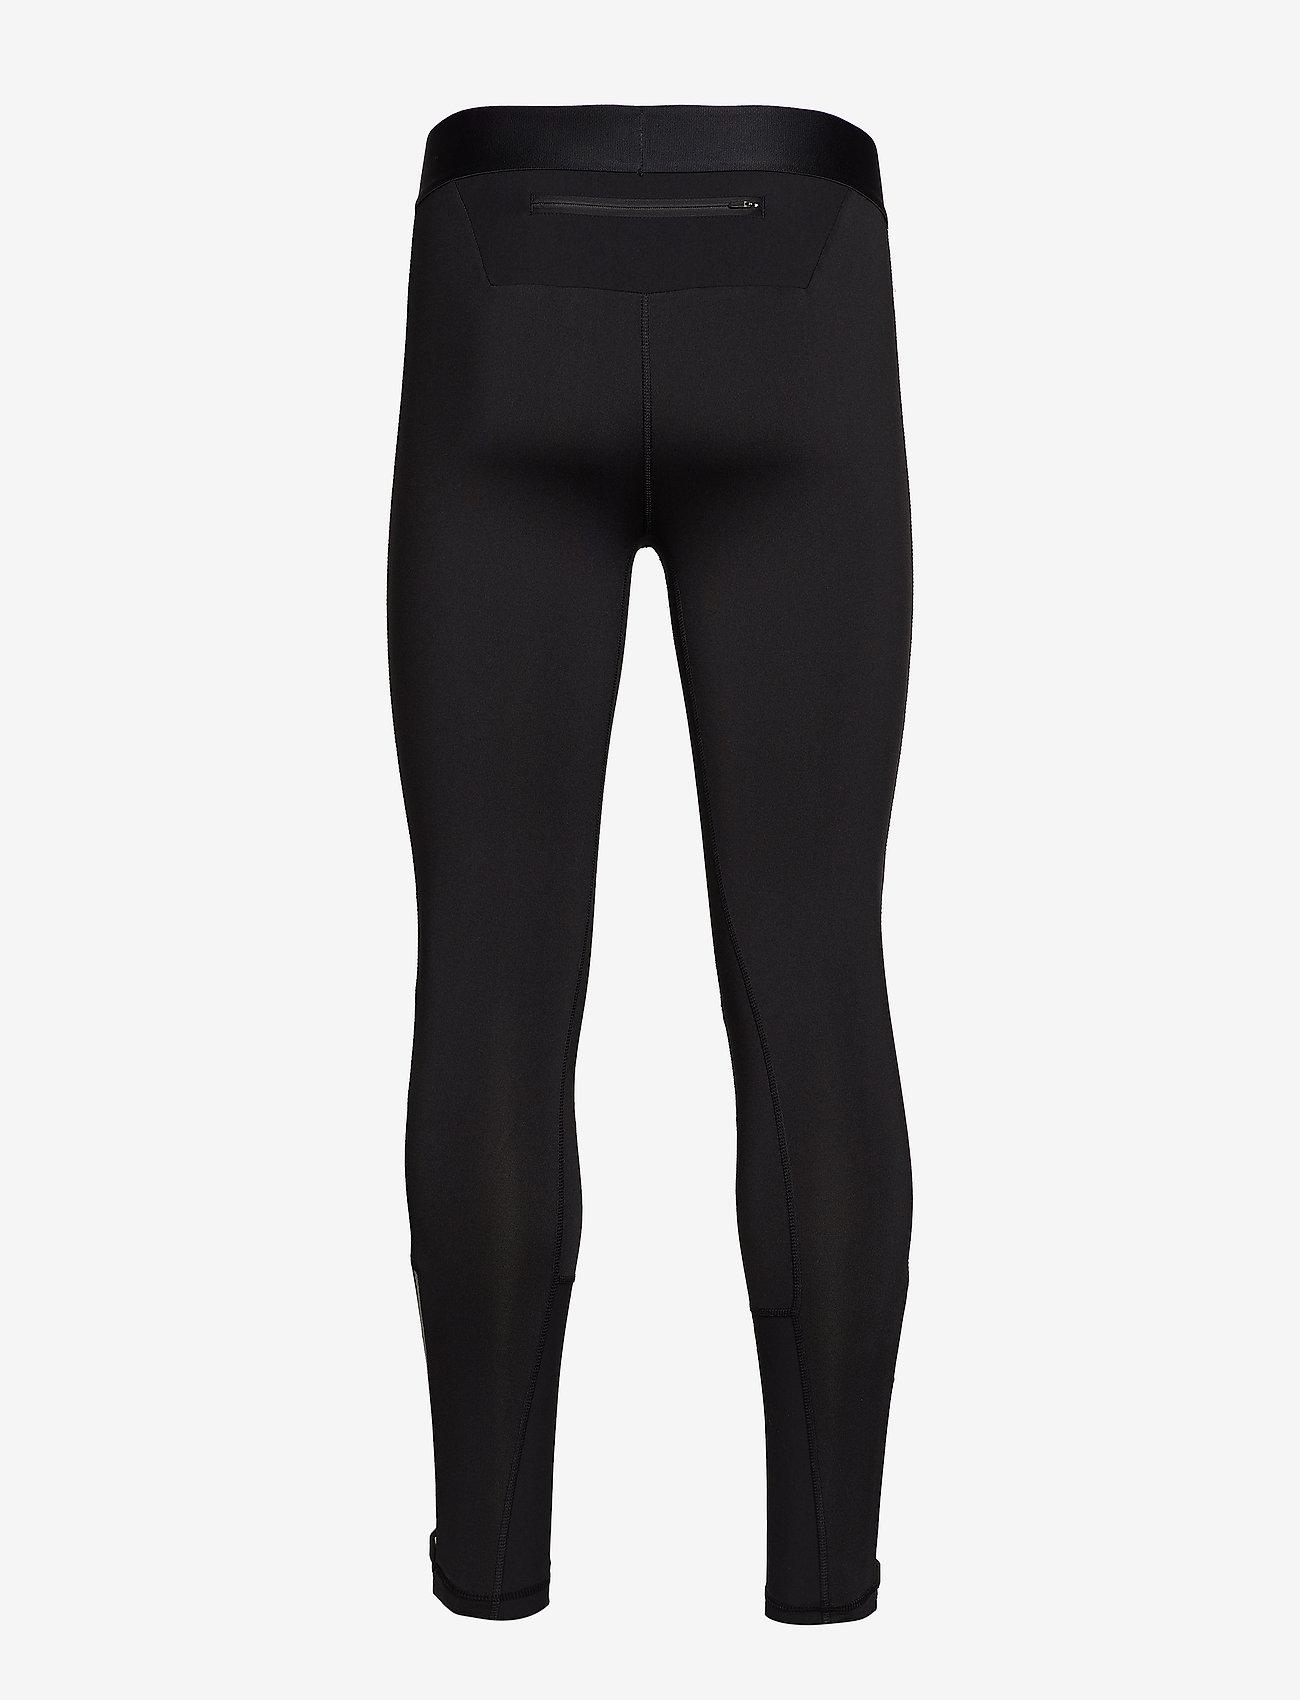 adidas Performance - Agravic tight - running & training tights - black - 1